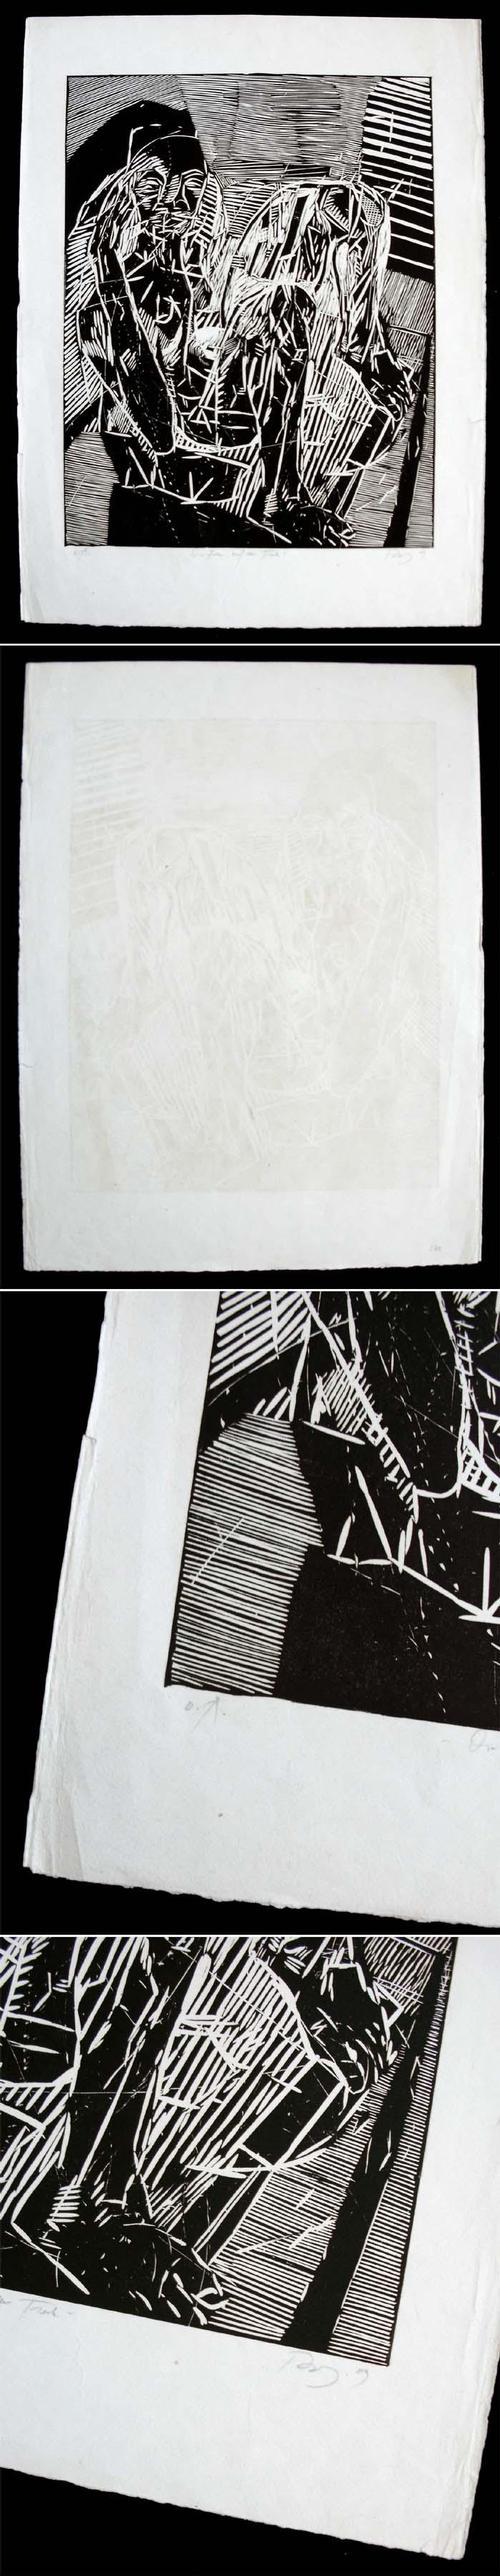 Thomas Rug - Die Frau auf dem Tisch. Linolschnitt, 1989. kopen? Bied vanaf 220!